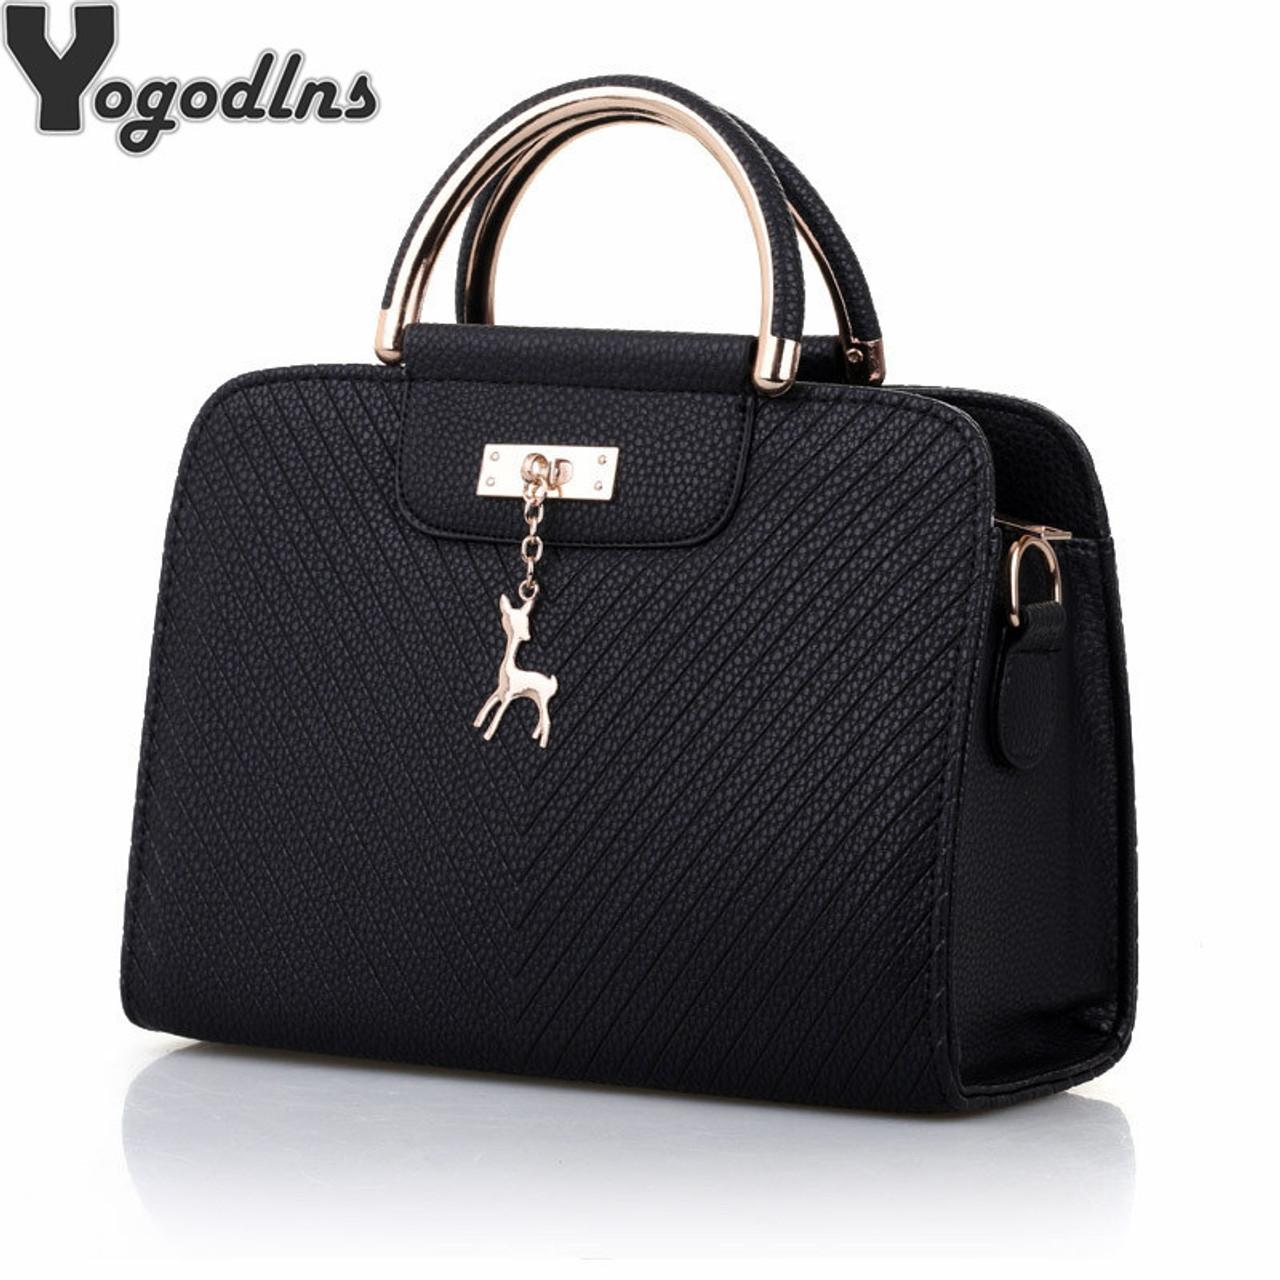 91c26b313307 Fashion Handbag 2018 New Women Leather Bag Large Capacity Shoulder Bags  Casual Tote Simple Top-handle Hand Bags Deer Decor - OnshopDeals.Com